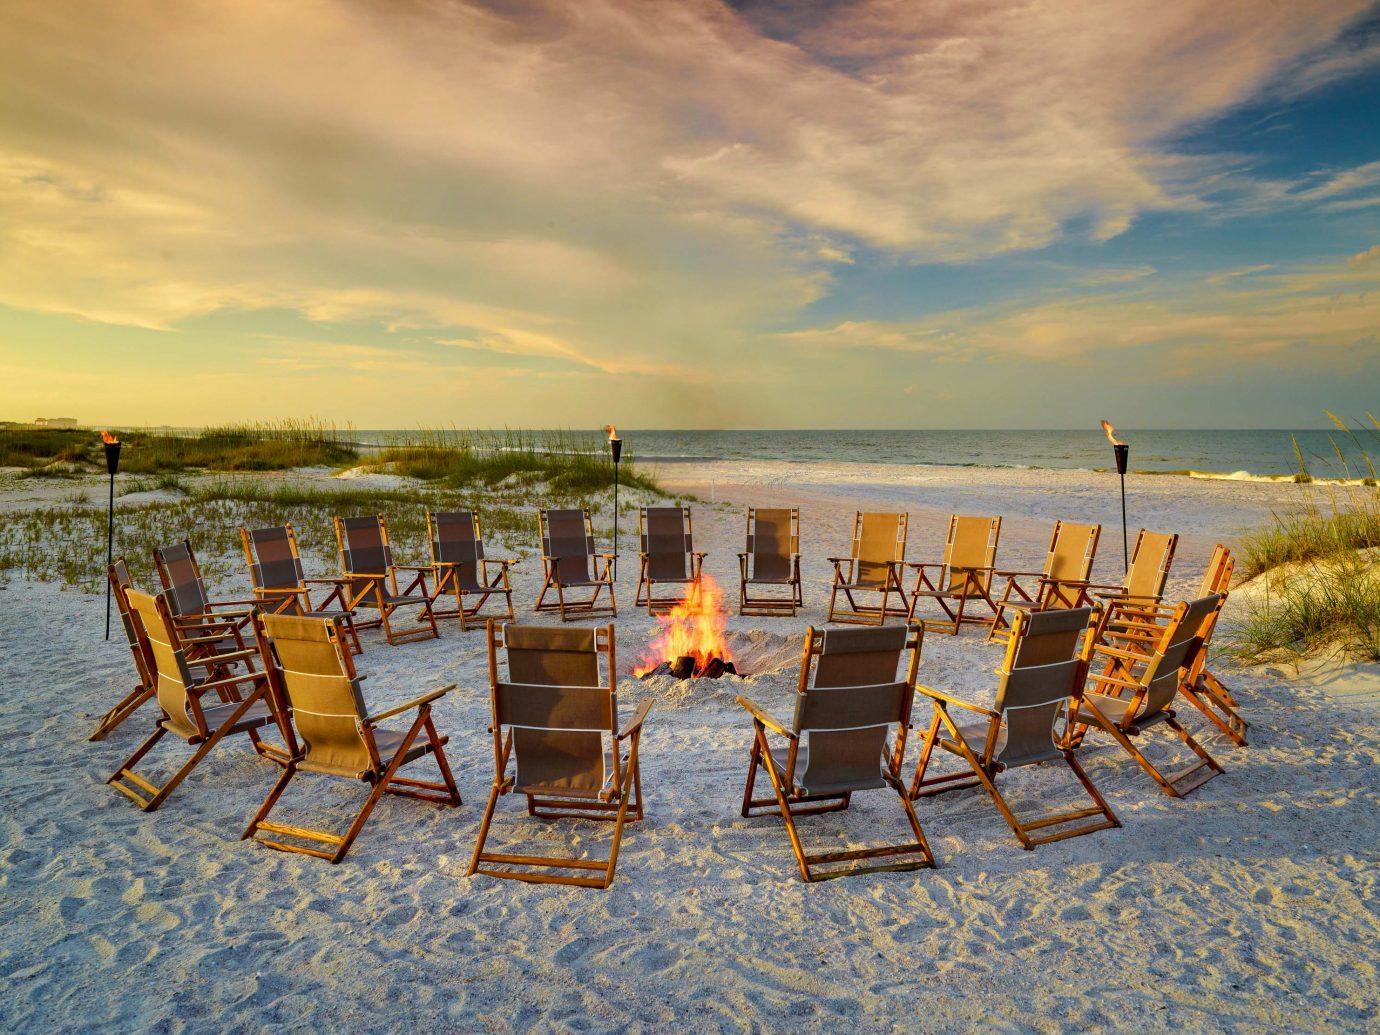 Omni Amelia Island Plantation Resort beach